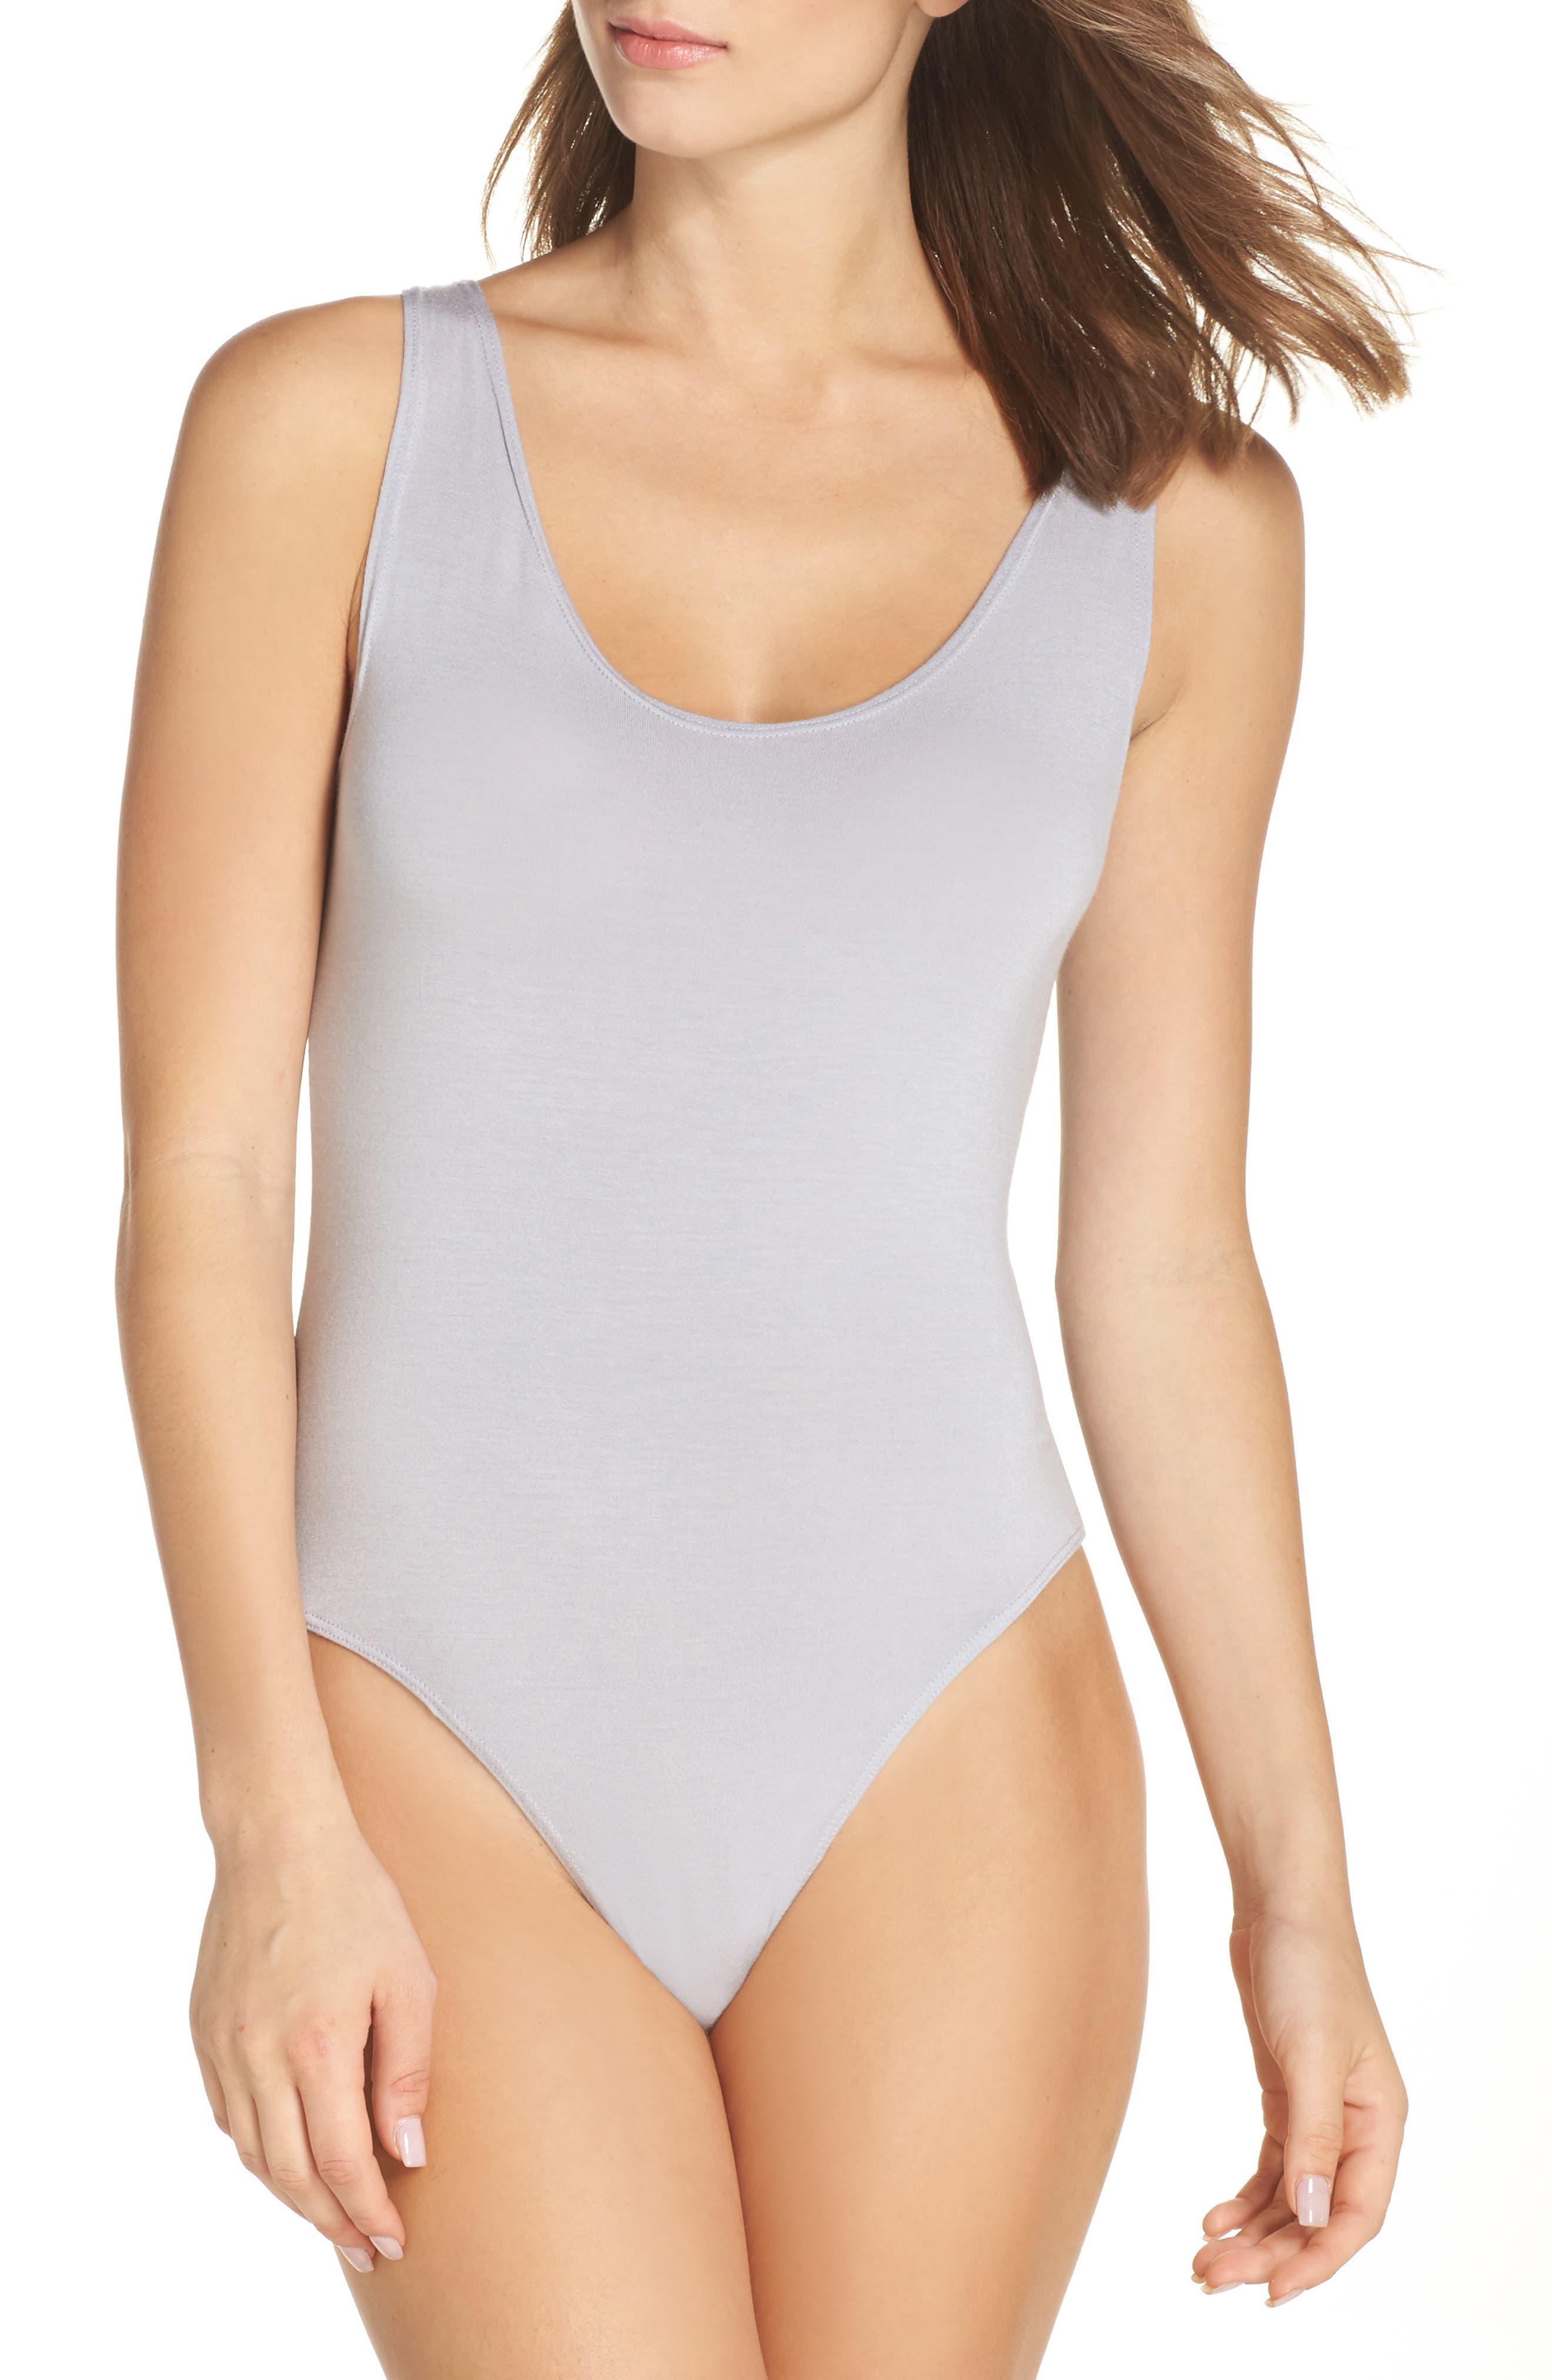 Olympia Theodora Body Lover Thong Bodysuit